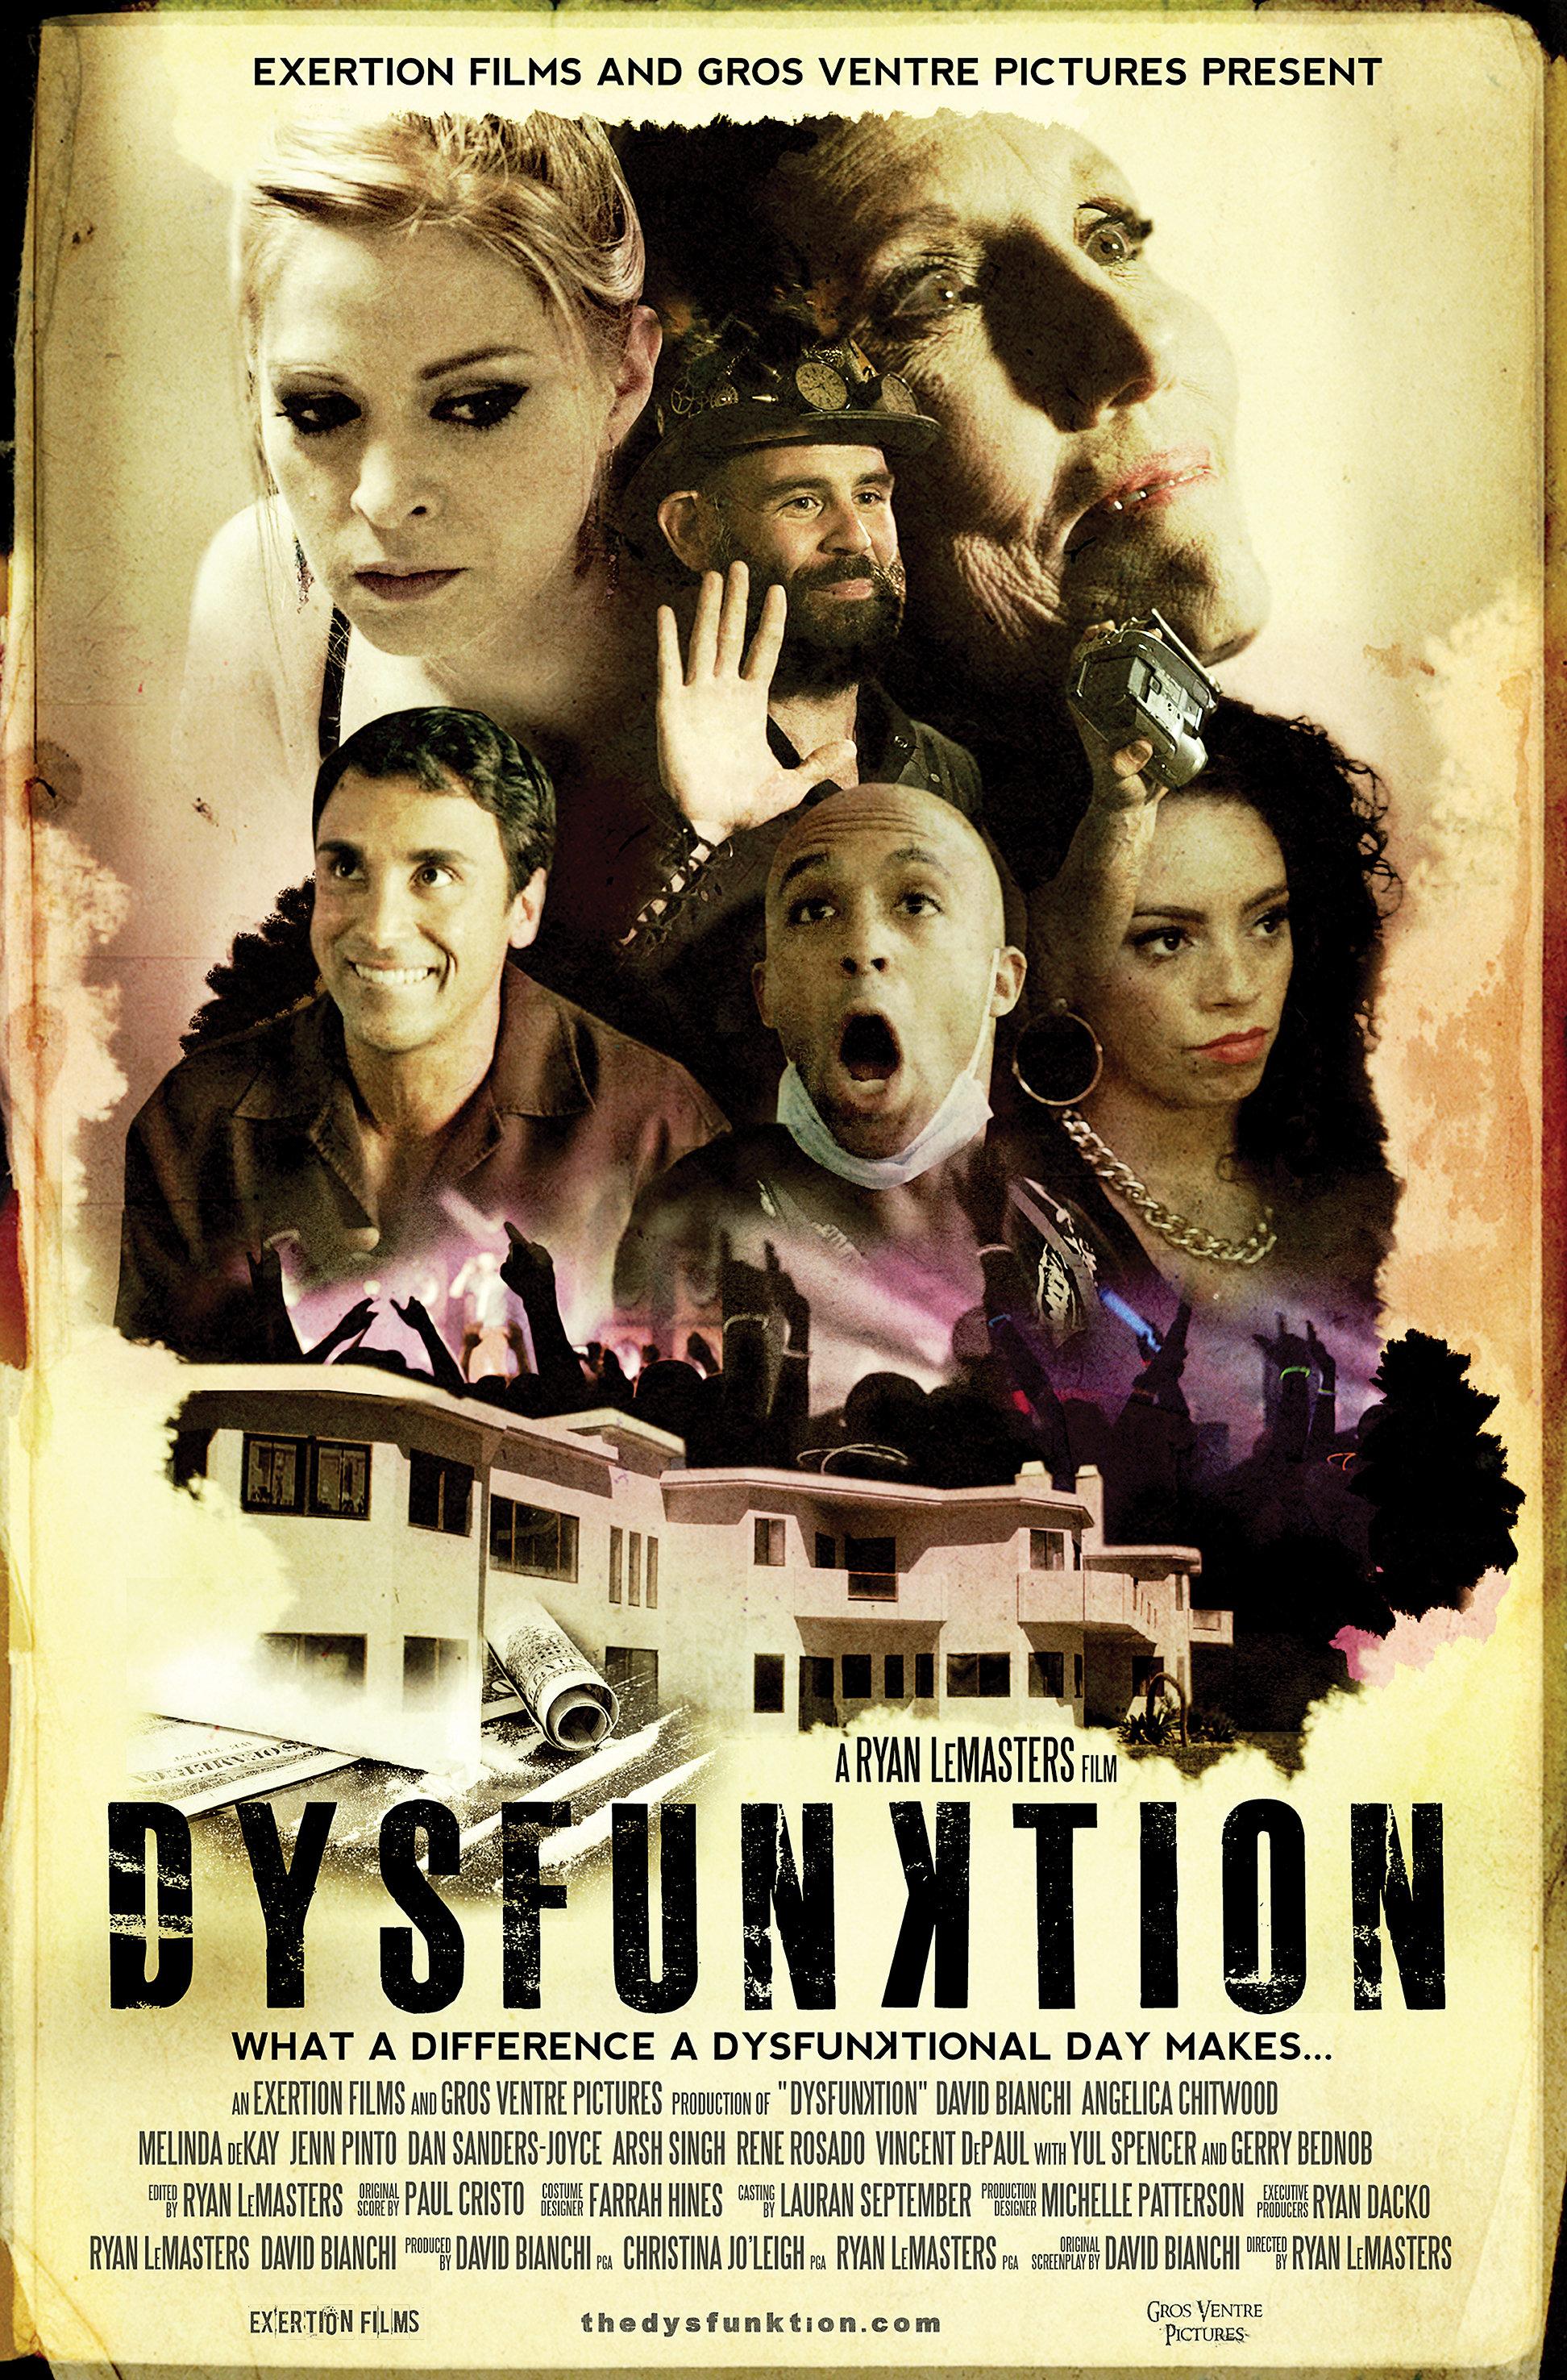 دانلود زیرنویس فارسی فیلم All Out Dysfunktion!